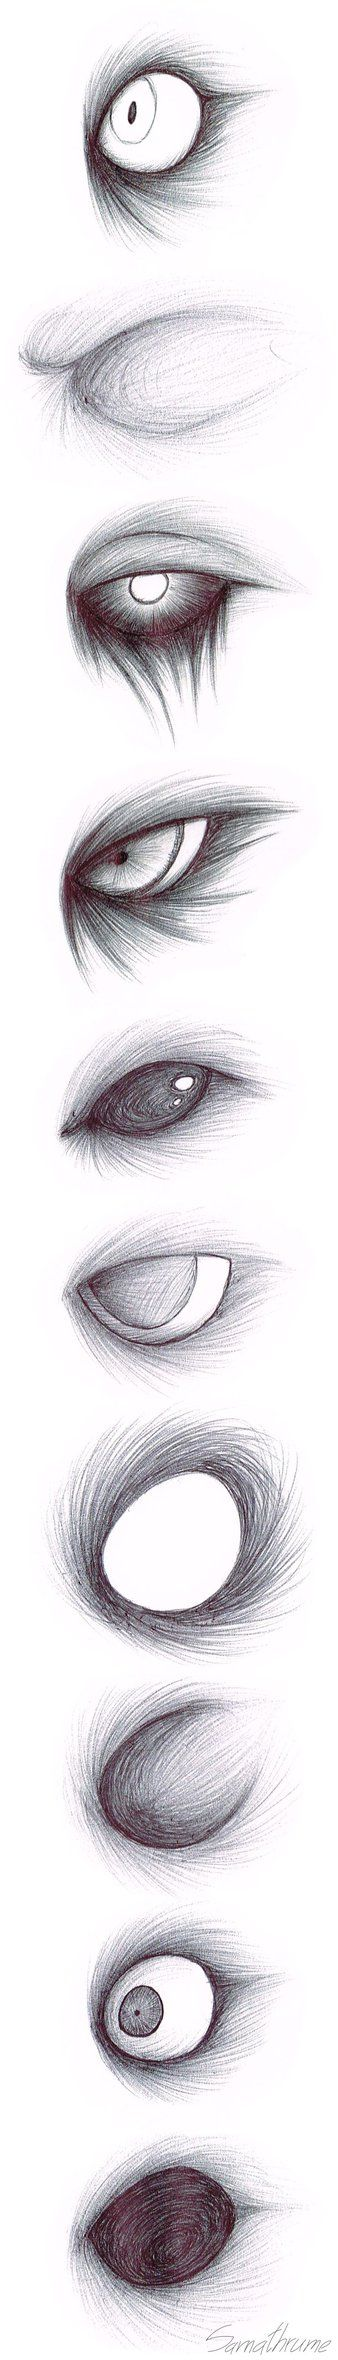 Creepypasta Eye Sketches by Samathrume on DeviantArt